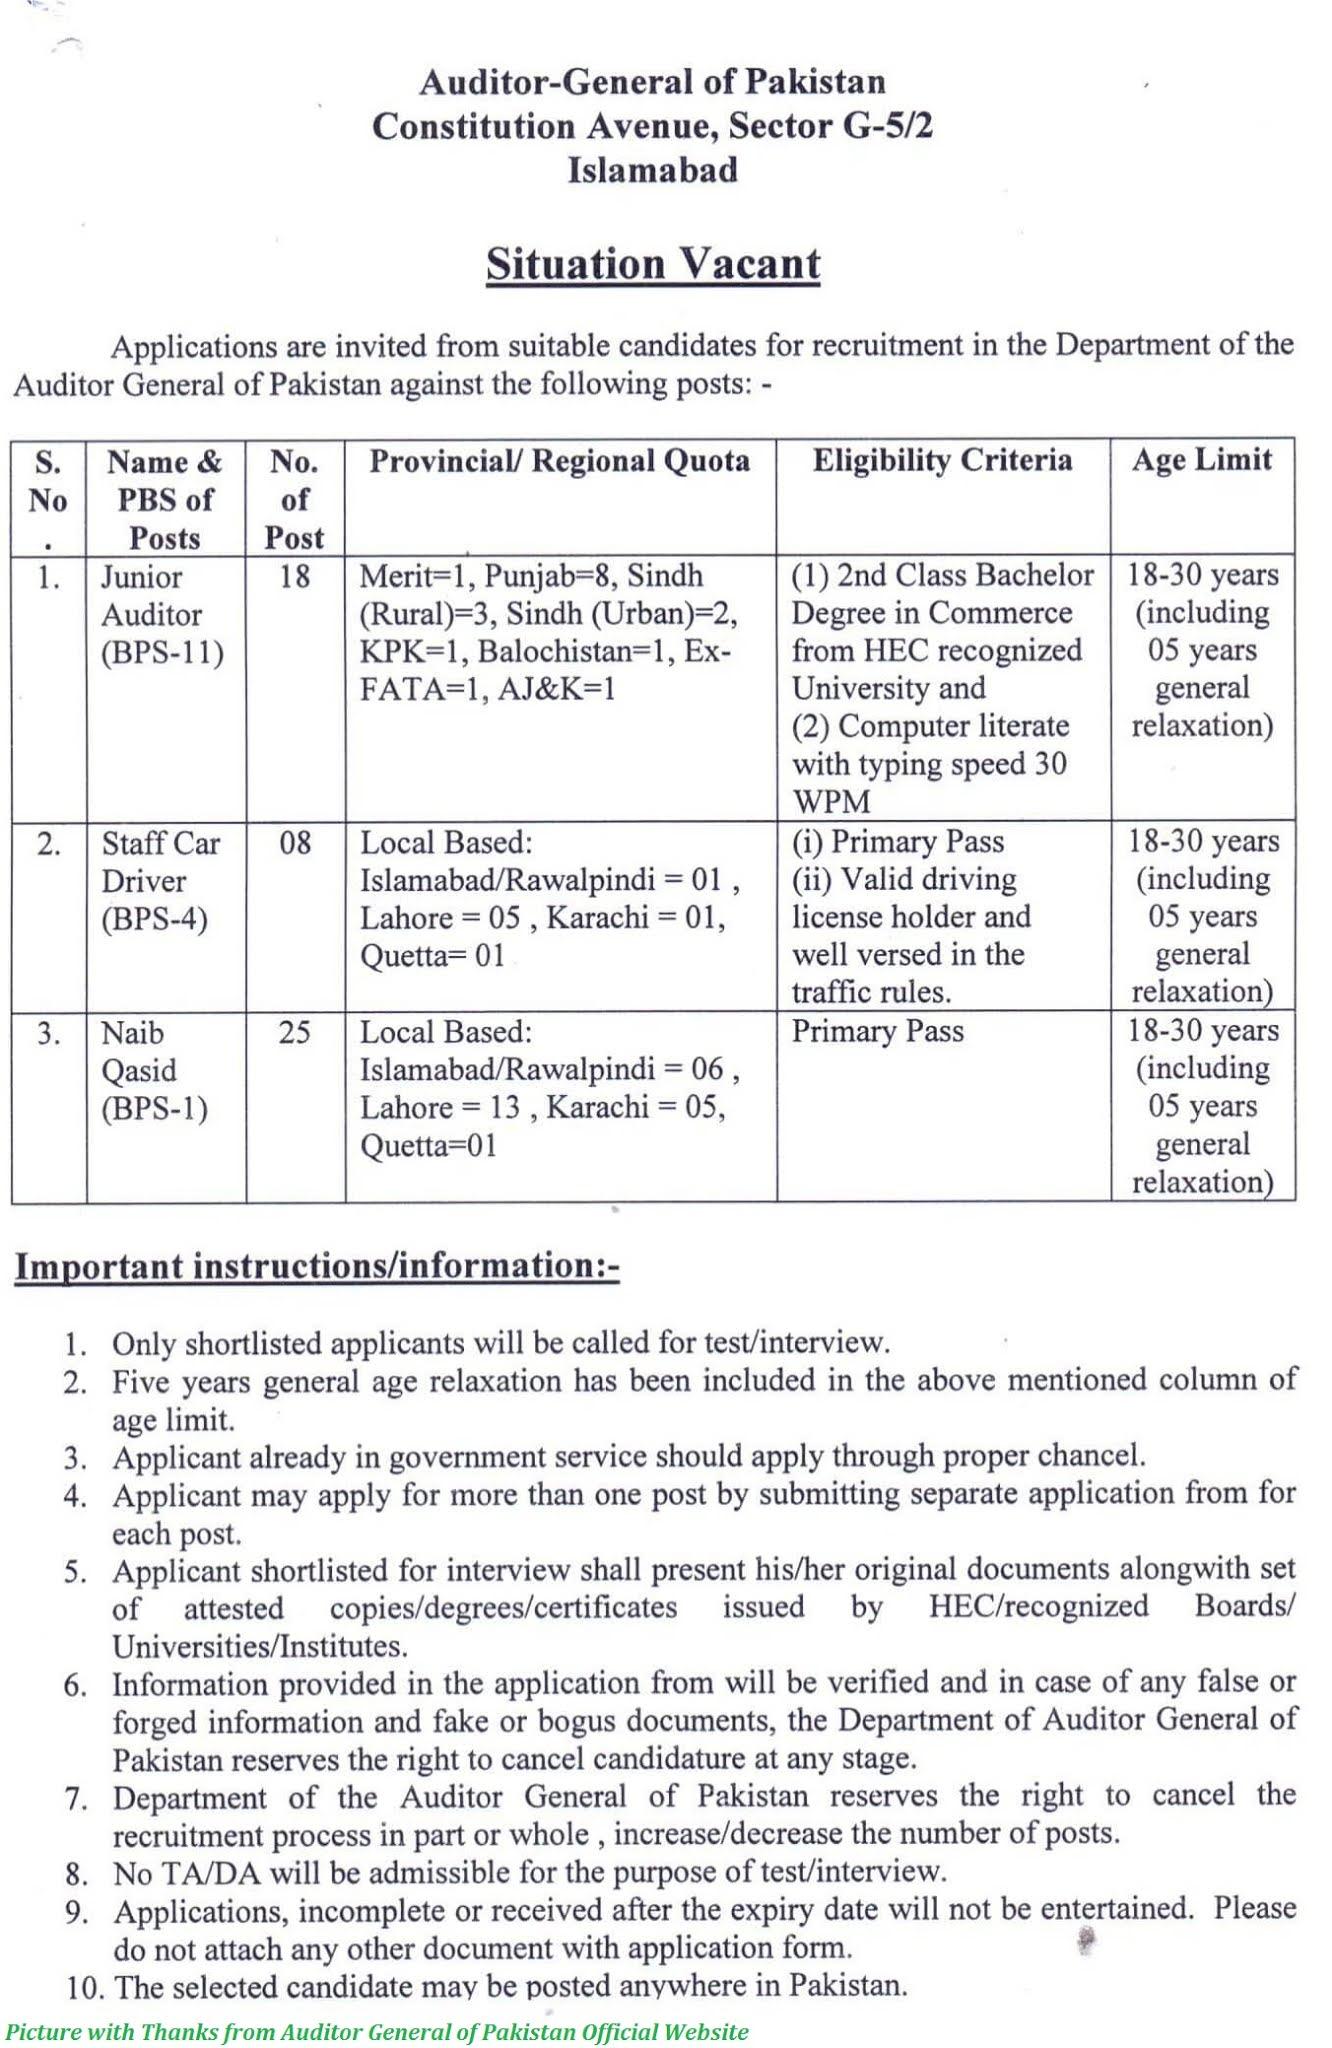 Auditor General of Pakistan Jobs Latest August 2020 - Latest Junior Auditor Jobs 2020